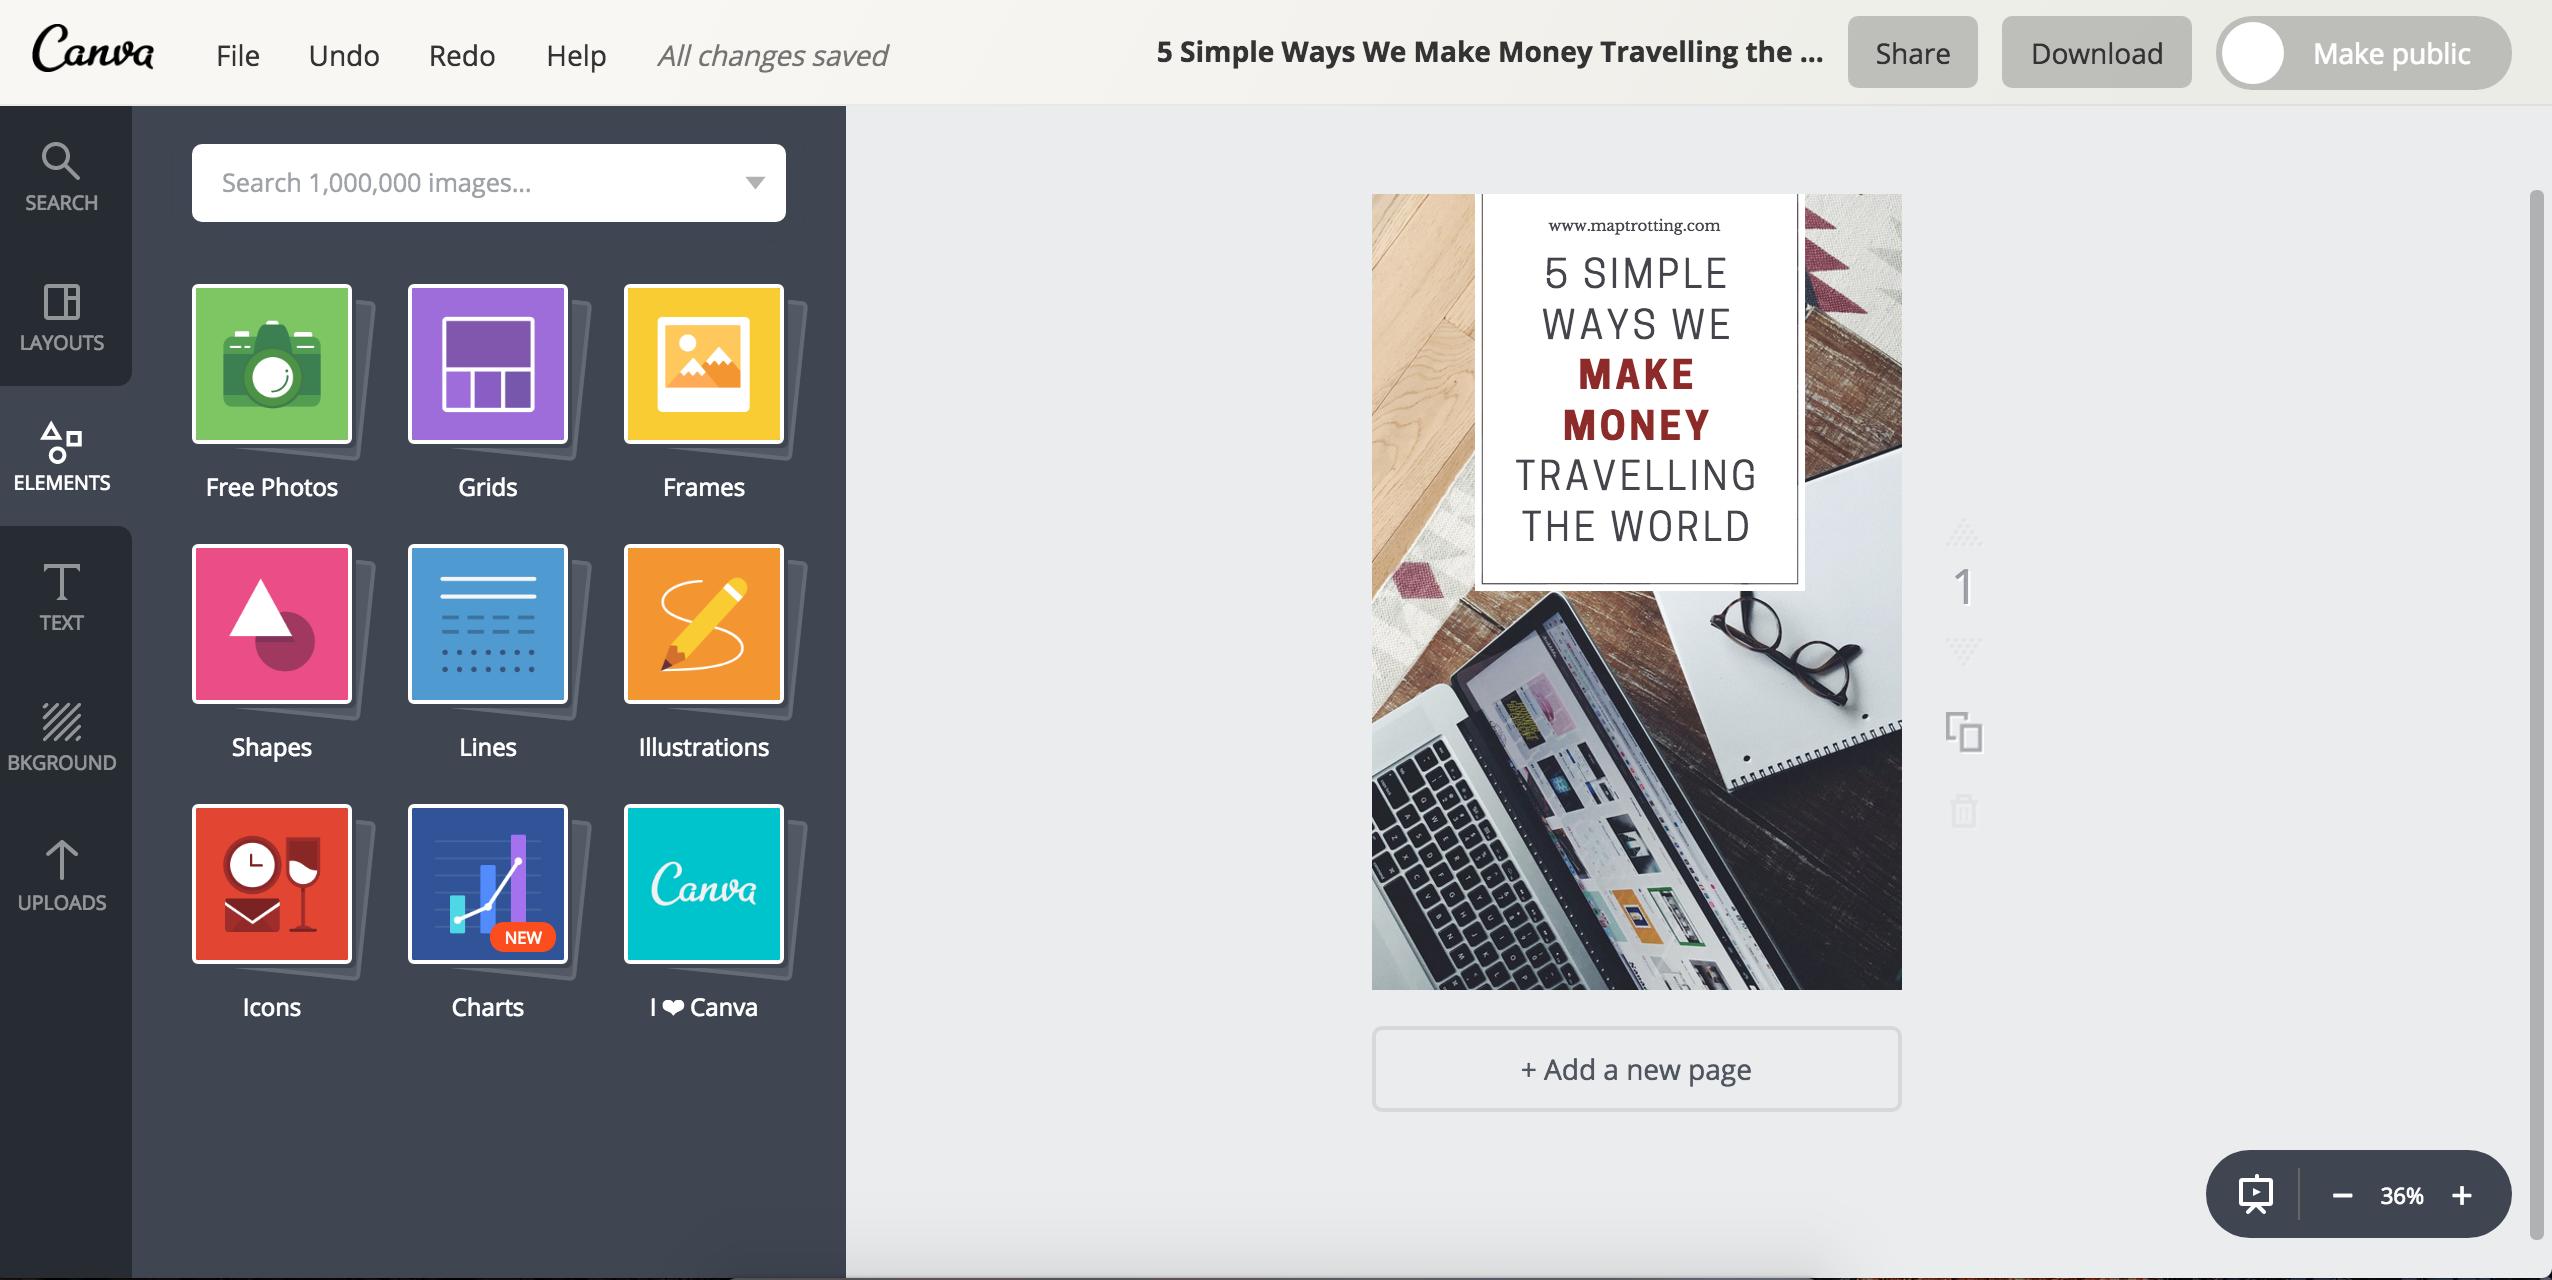 5 Simple Ways We Make Money Travelling the World